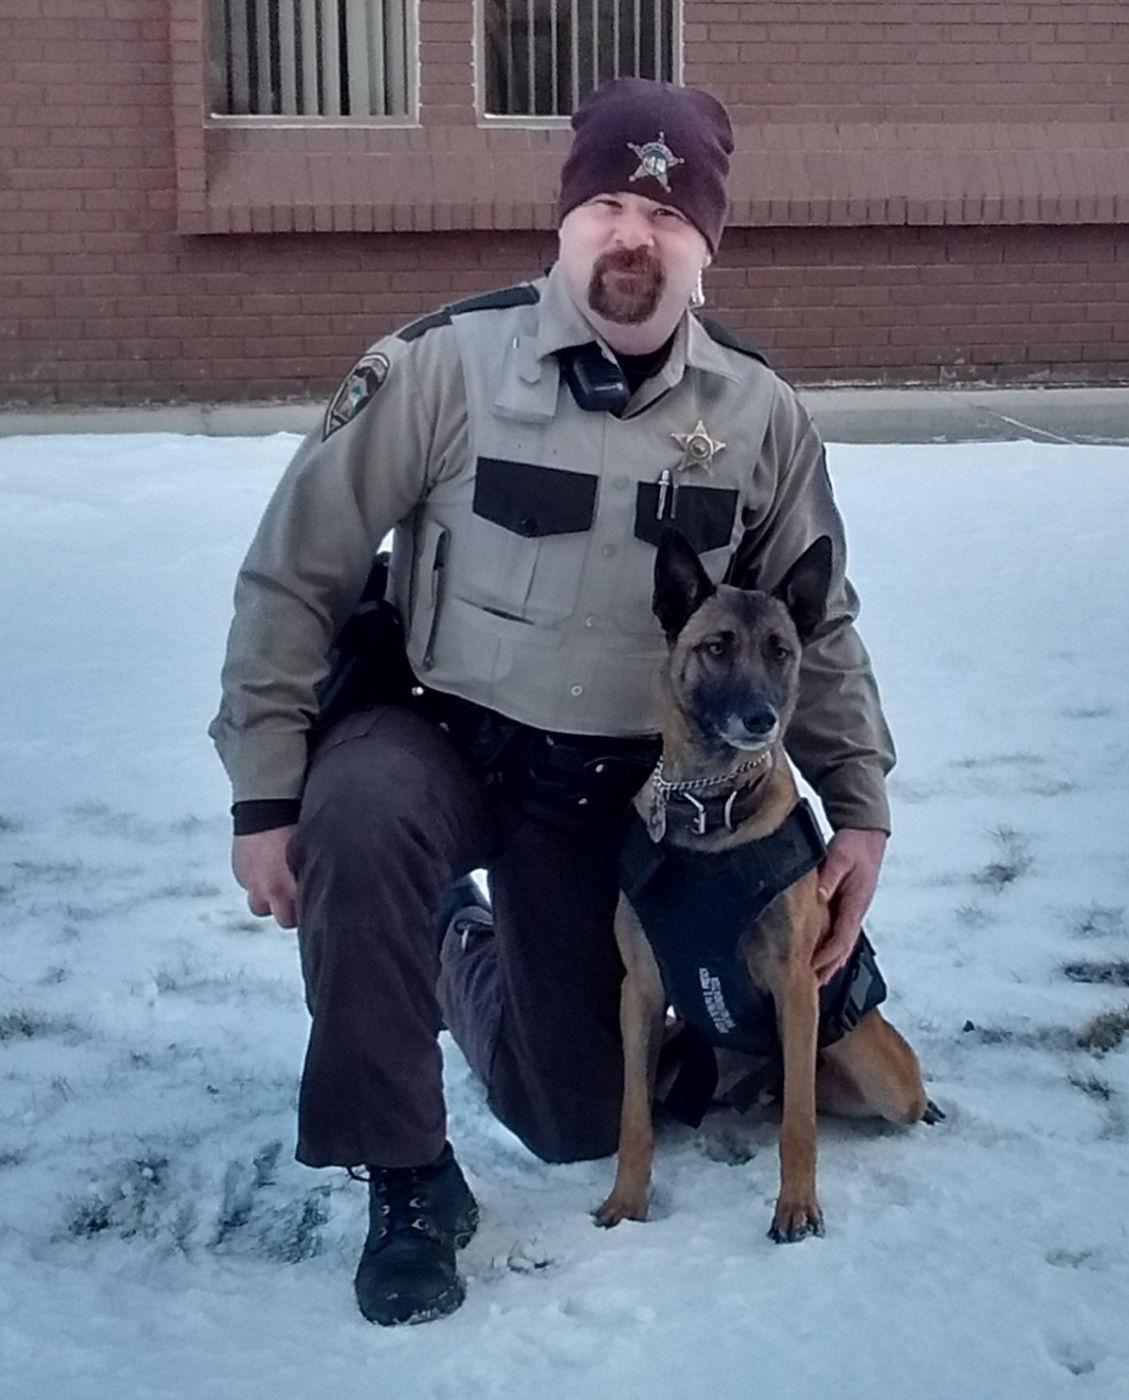 Deputy Adam Carlson and K-9 Cleo